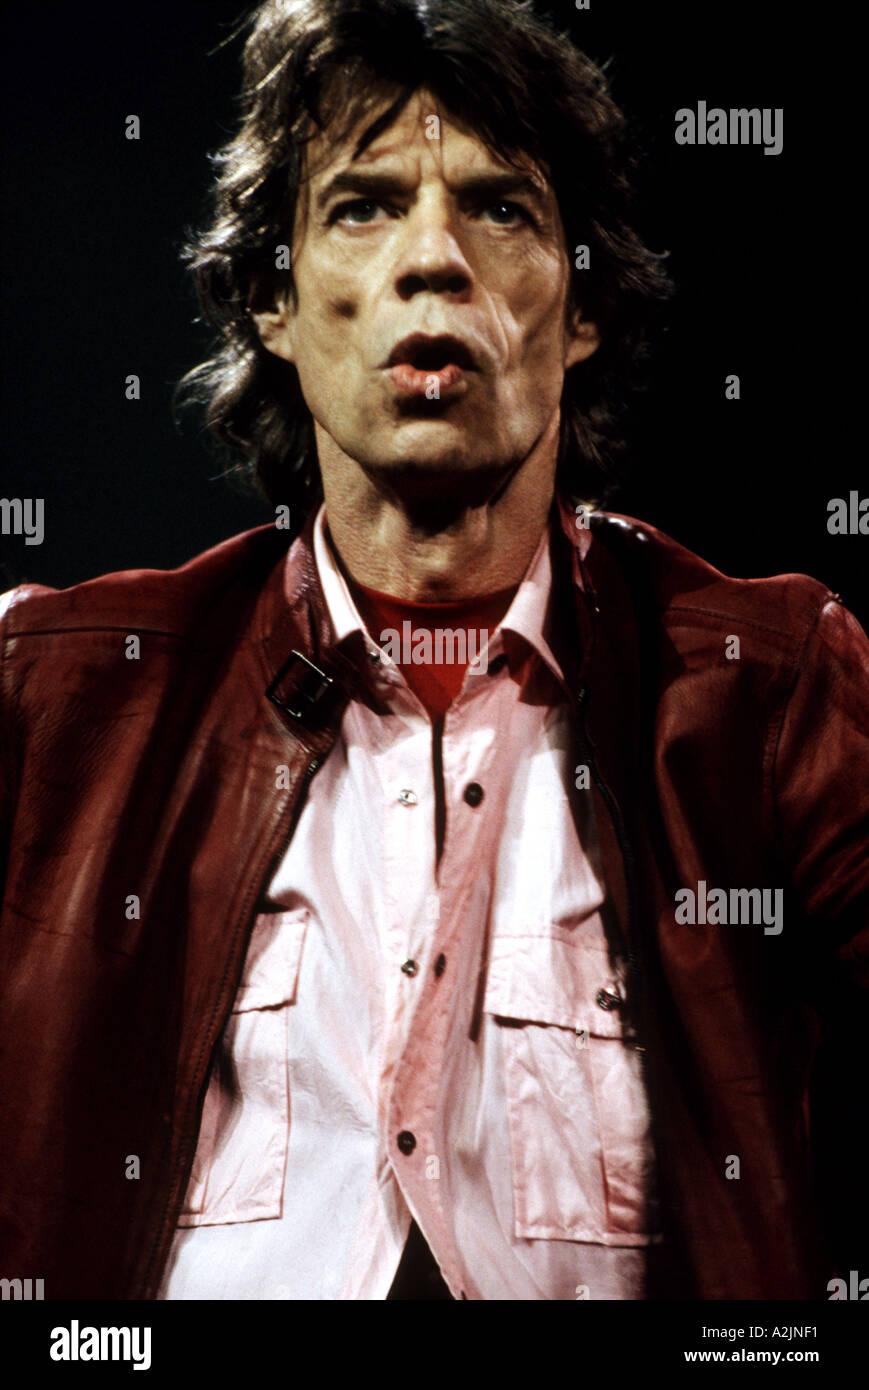 ROLLING STONES Mick Jagger Stock Photo